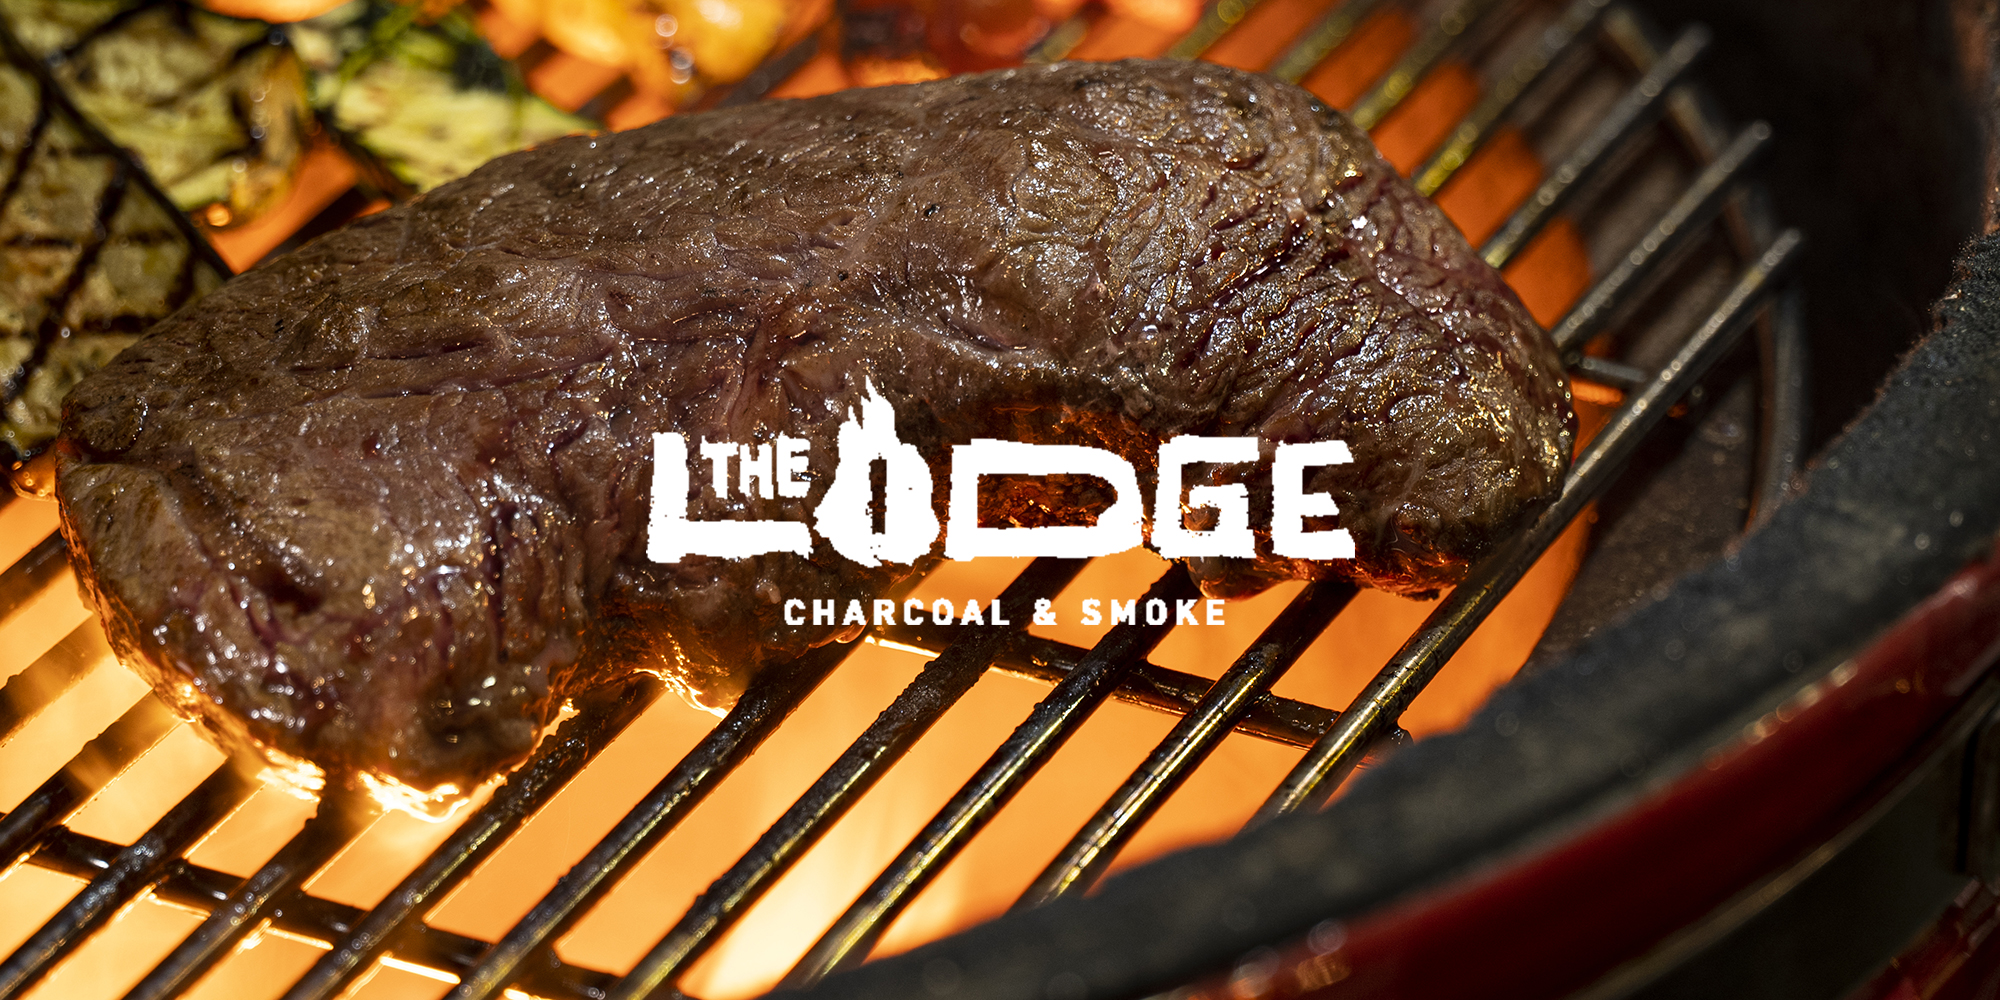 THE LODGE CHACOAL&SMOKE